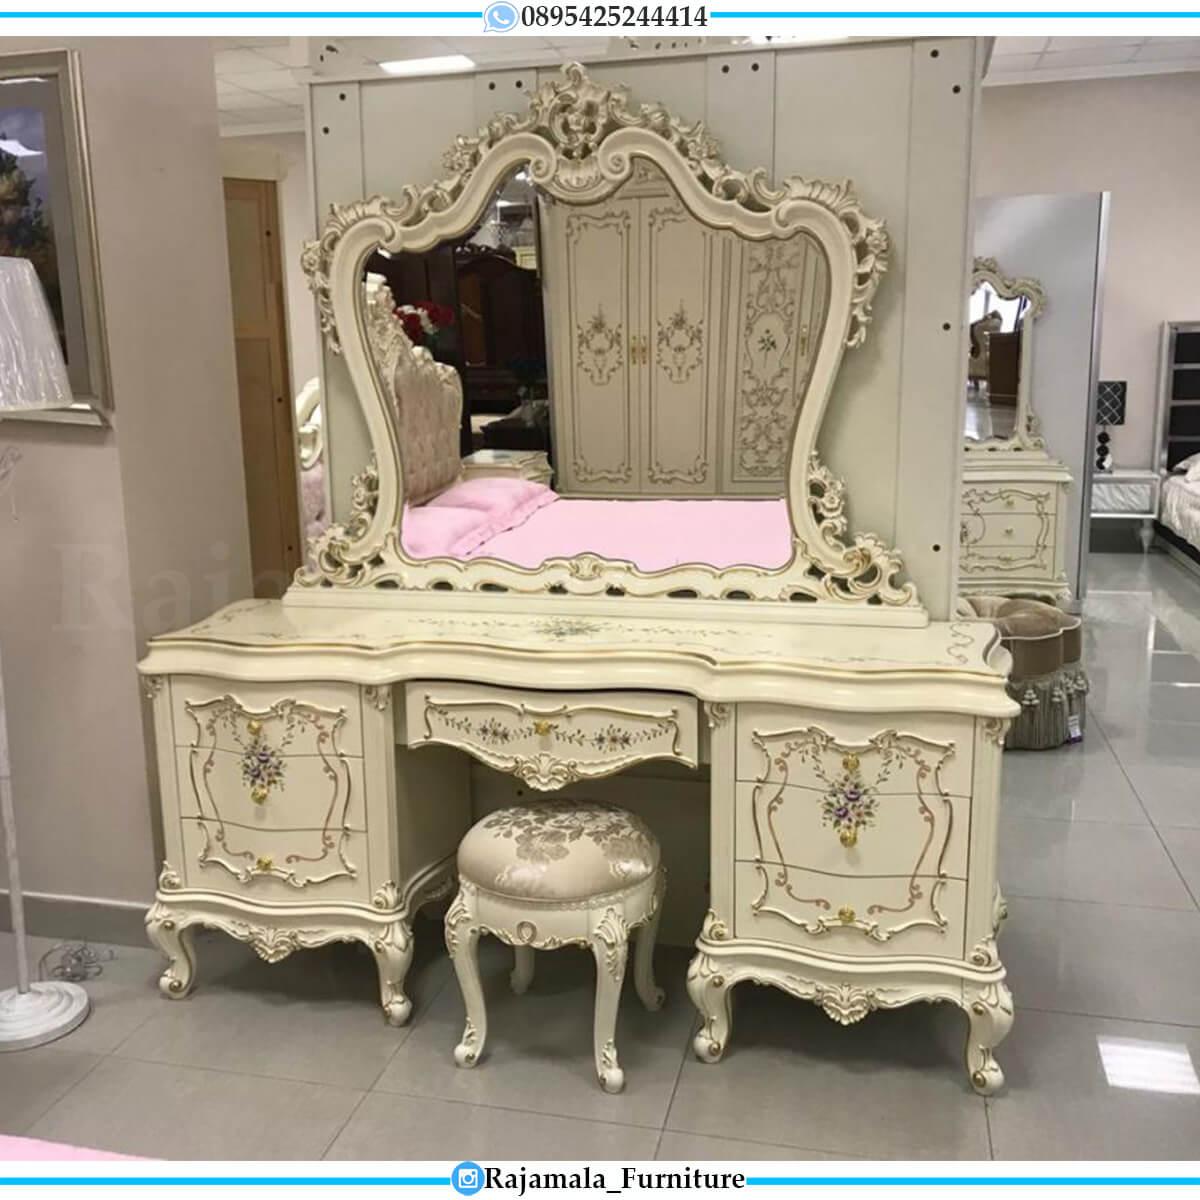 New Model Meja Rias Mewah Ukiran Luxury Vanity Room Classic Design RM-0583